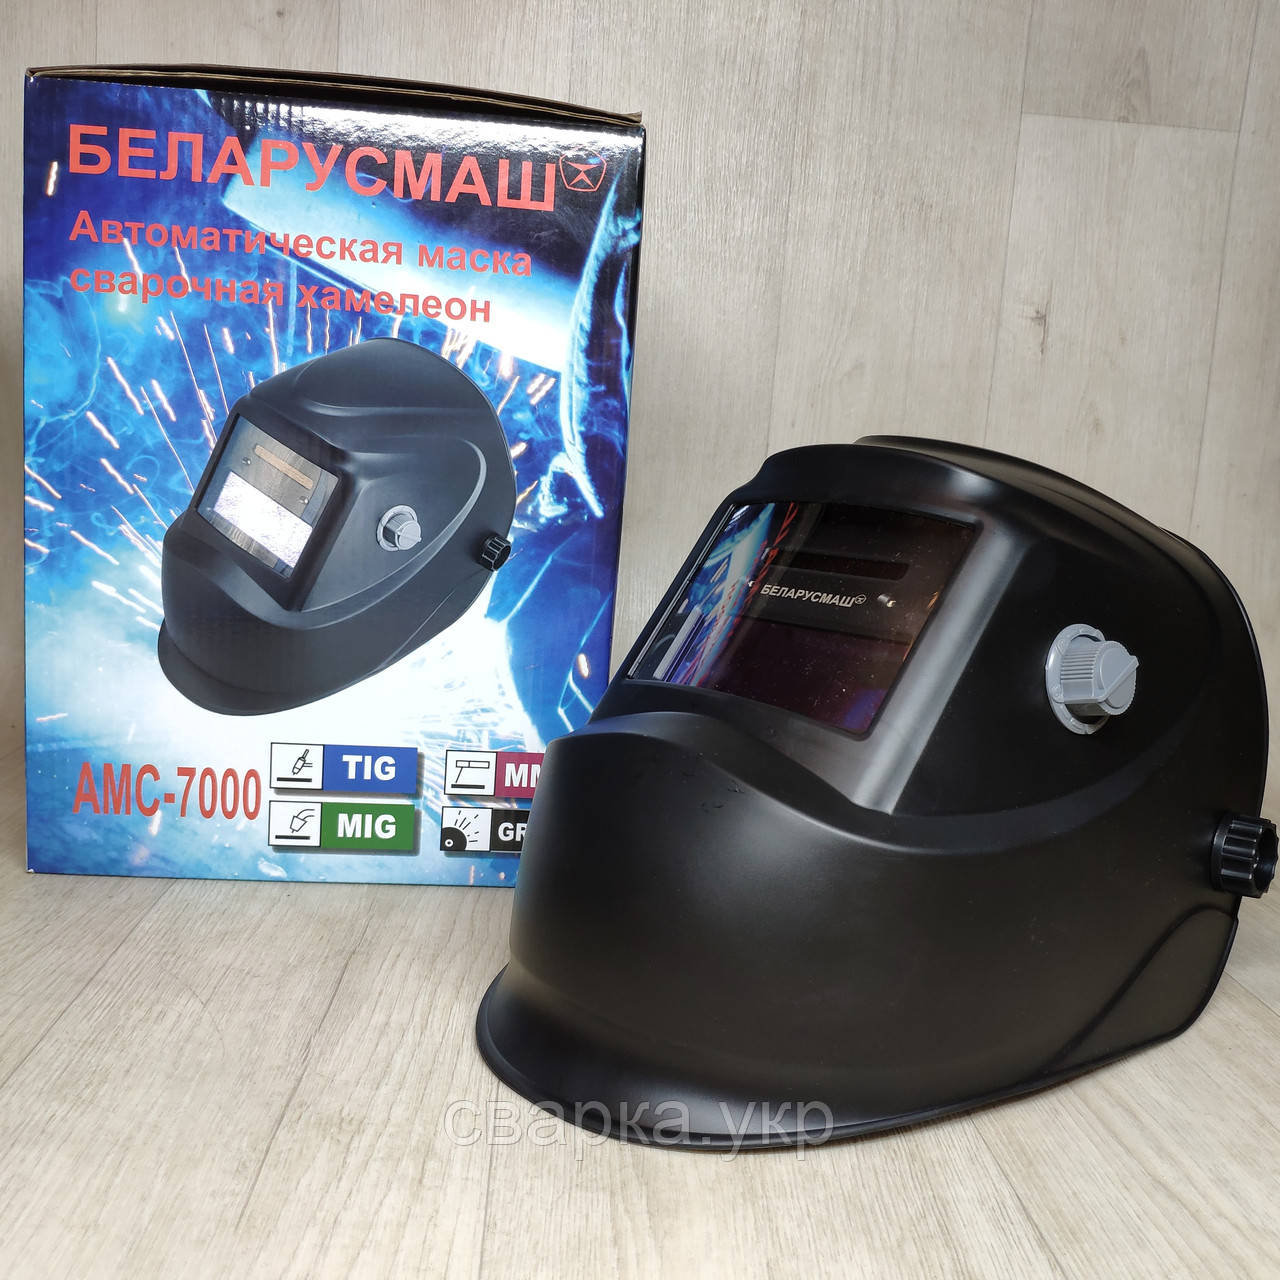 Сварочная маска Хамелеон Беларусмаш АМС-7000